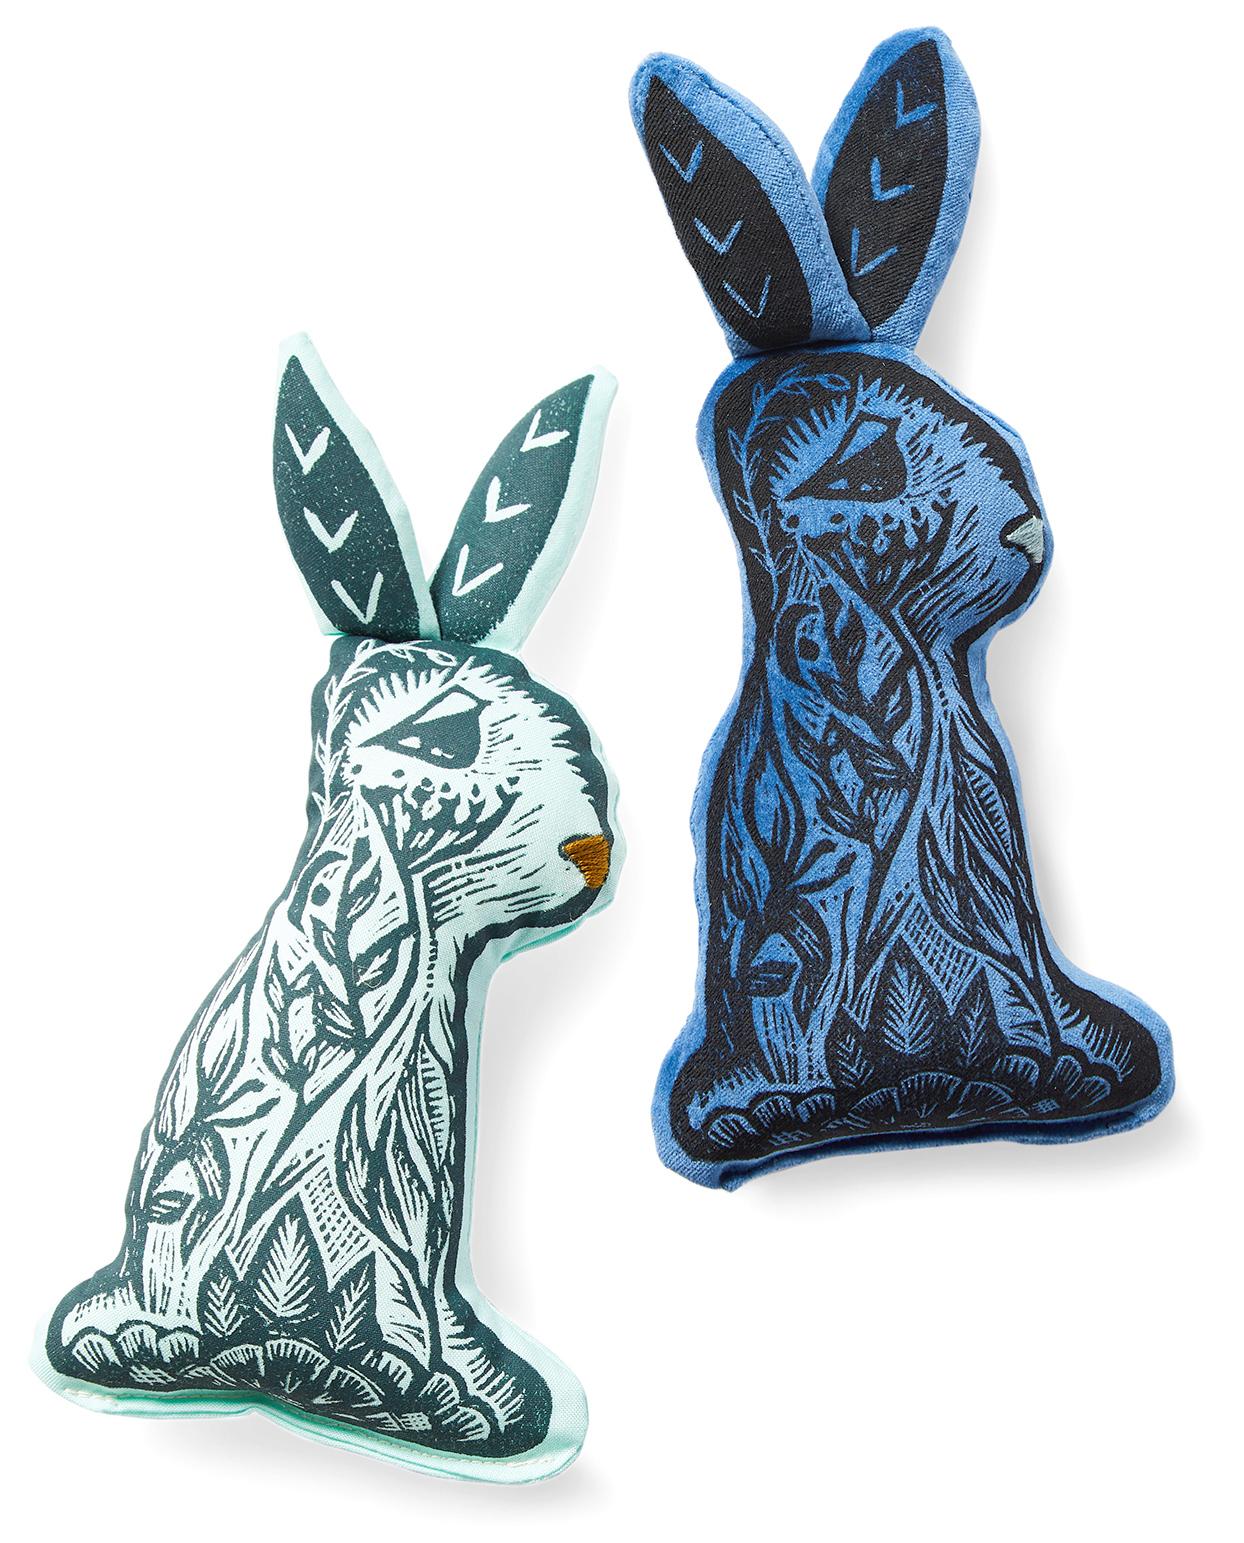 blue stuffed vintage printed plush bunnies